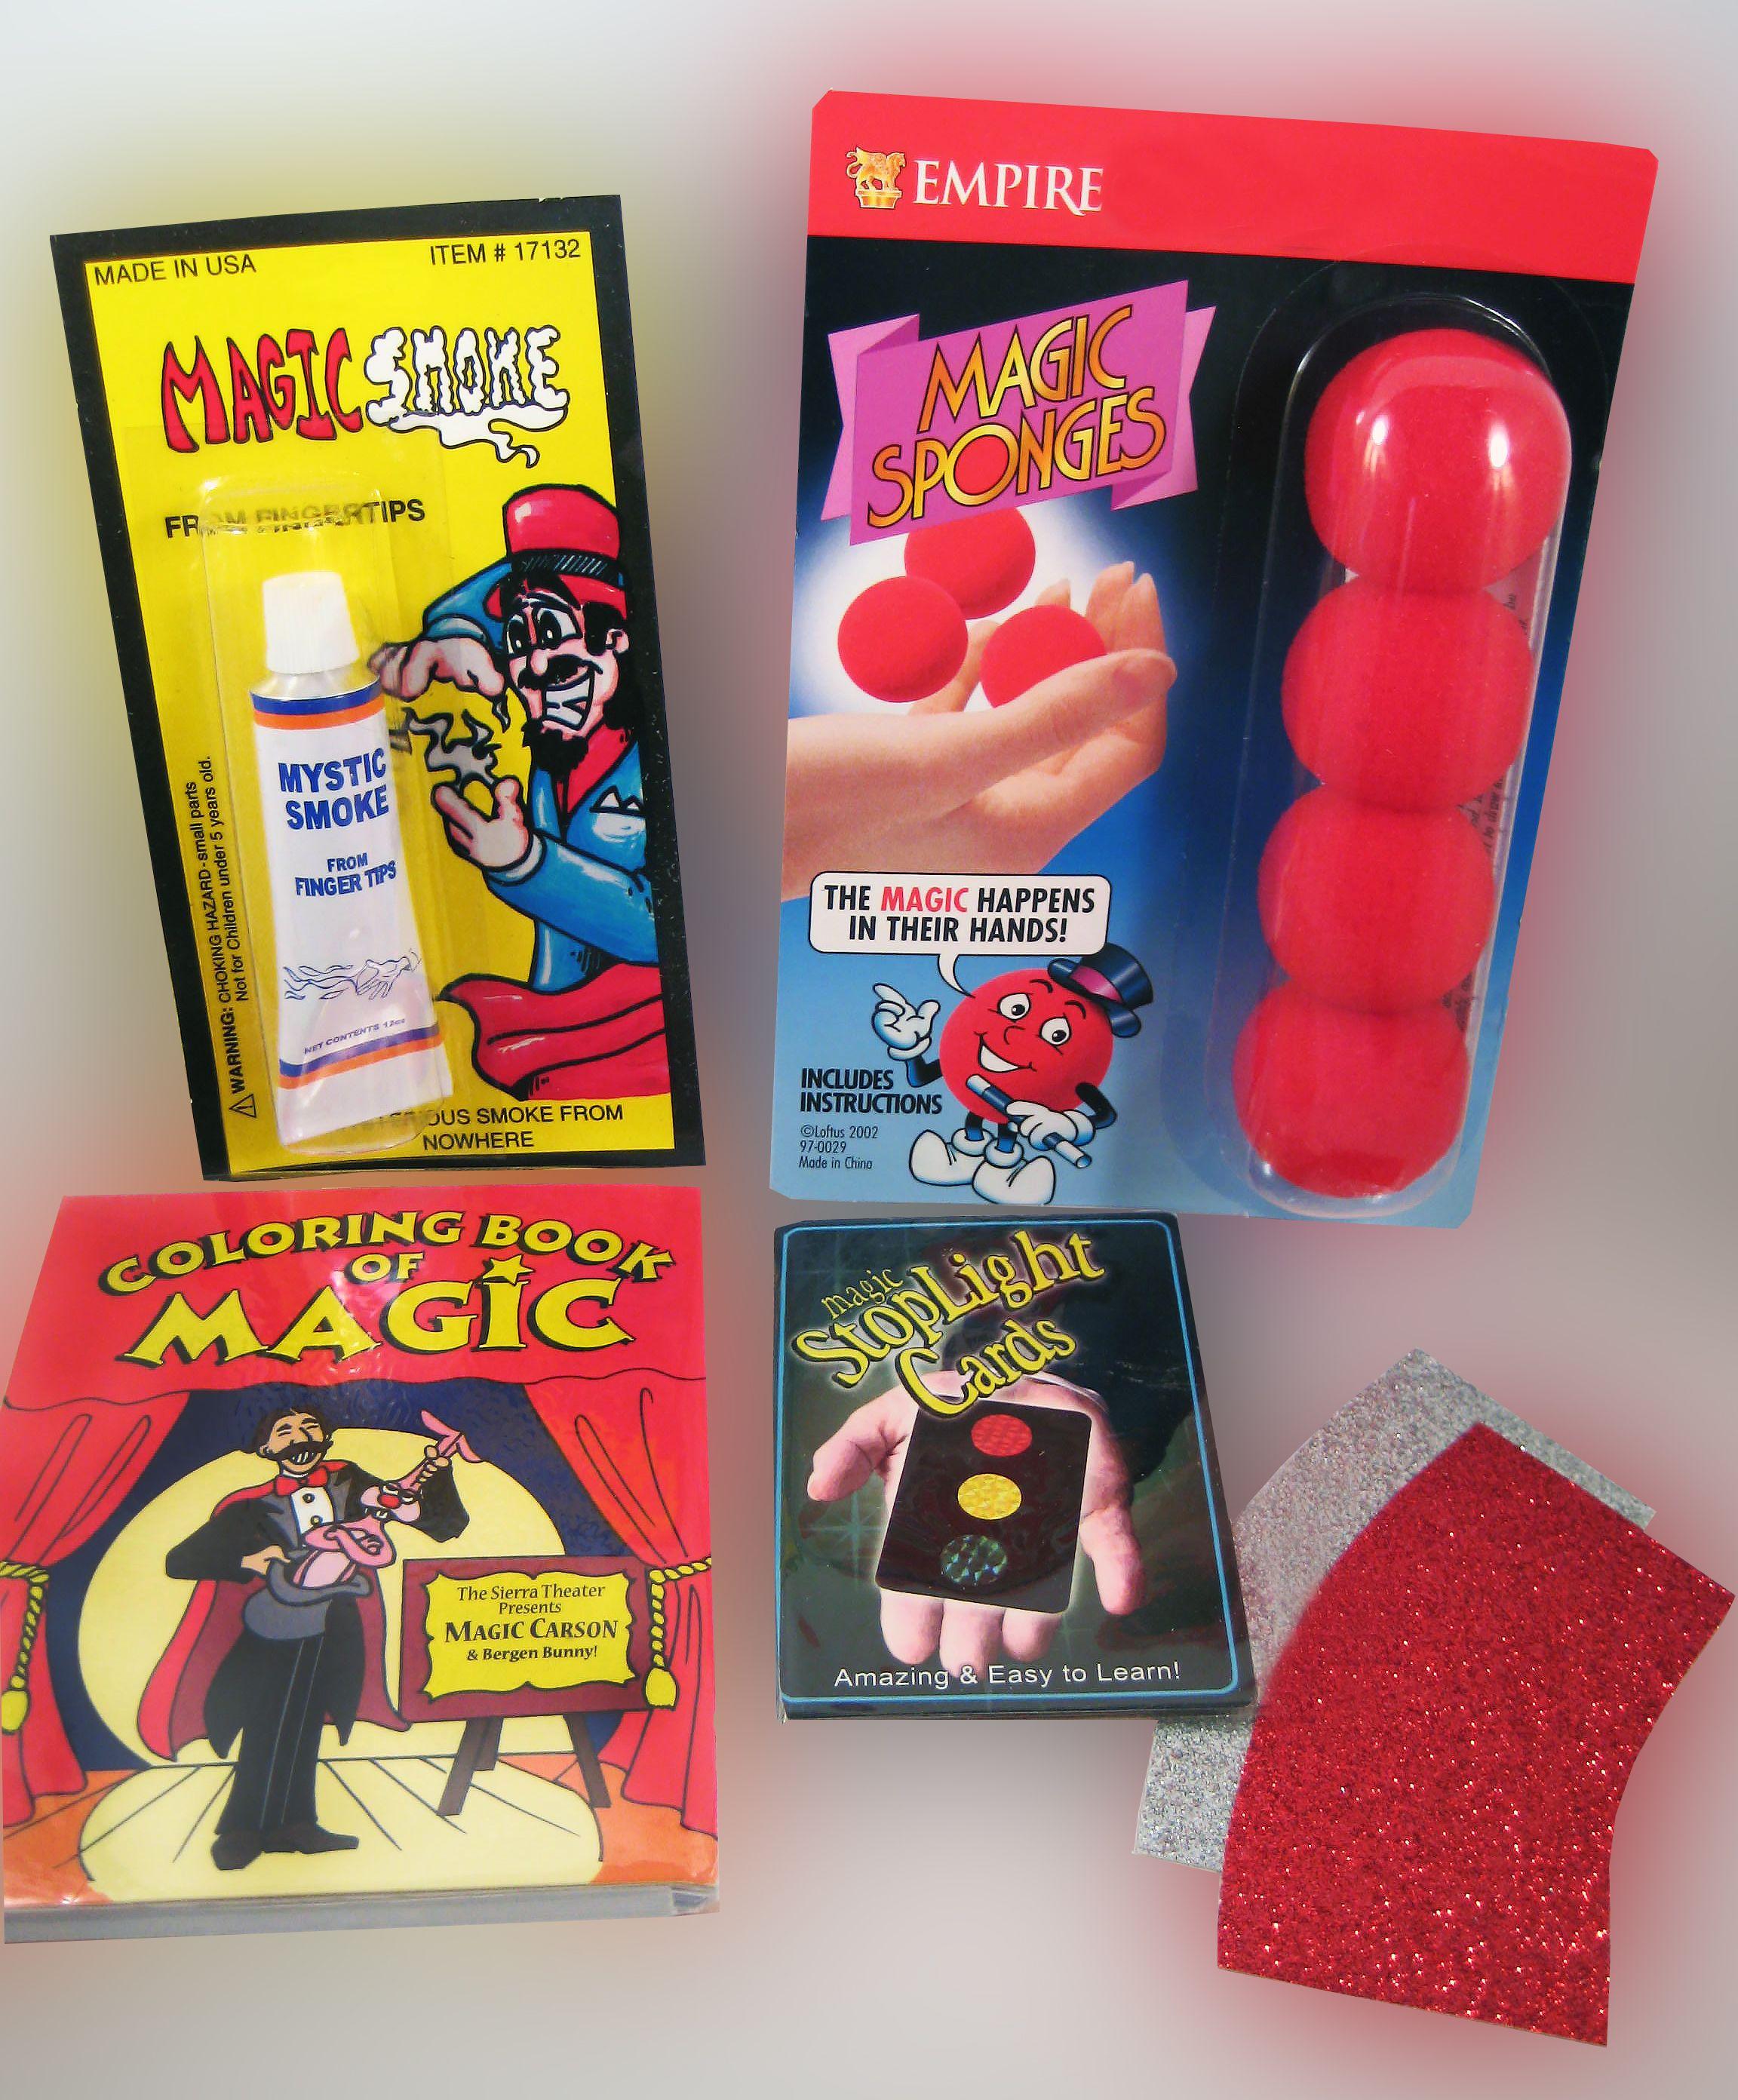 Starter Magic Kit 3 Easy Magic Tricks Amazing Magic Tricks Card Tricks